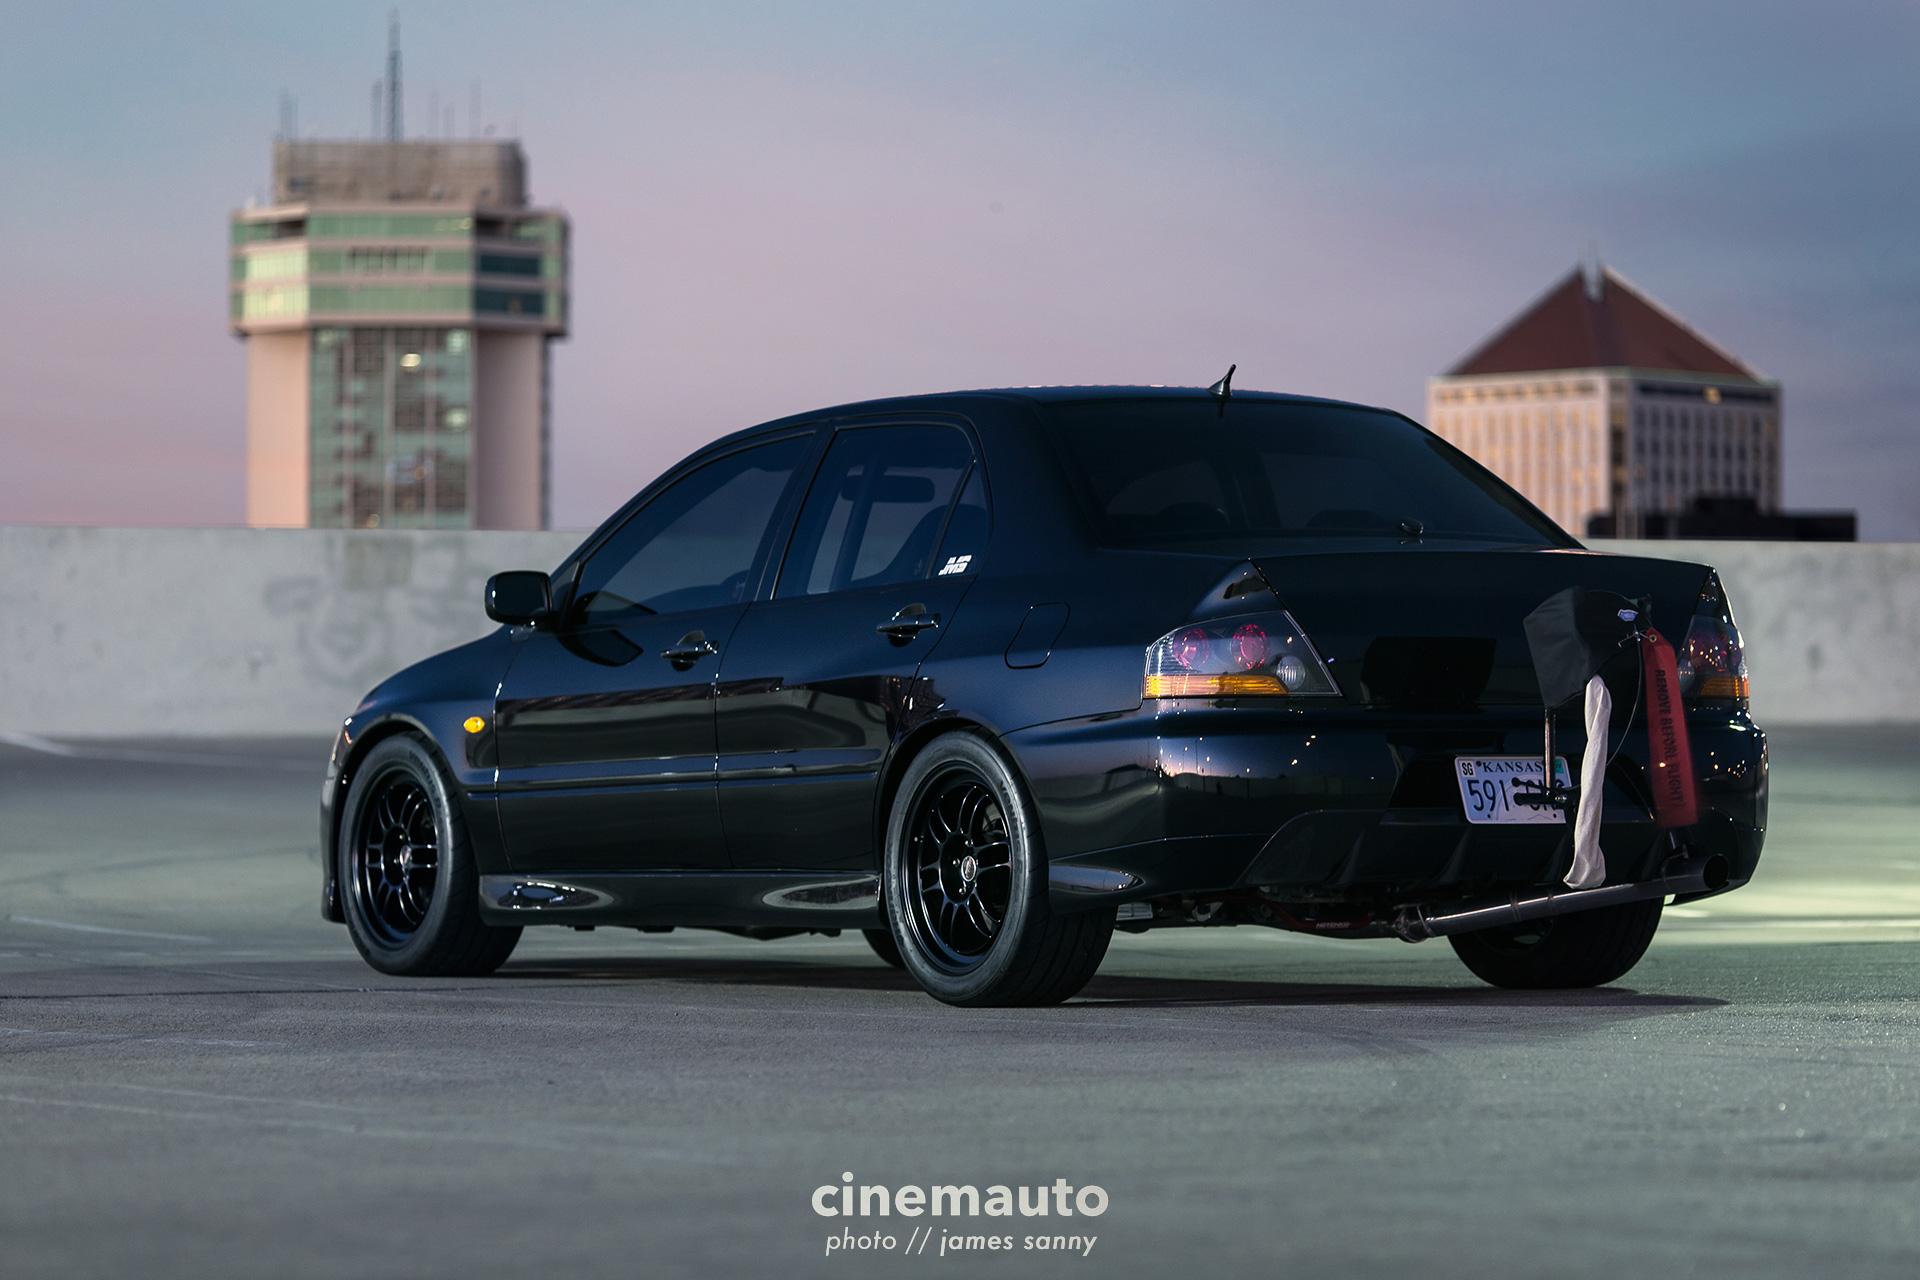 wichita-automotive-photographer-cinemauto-james-sanny-tj4sm.jpg